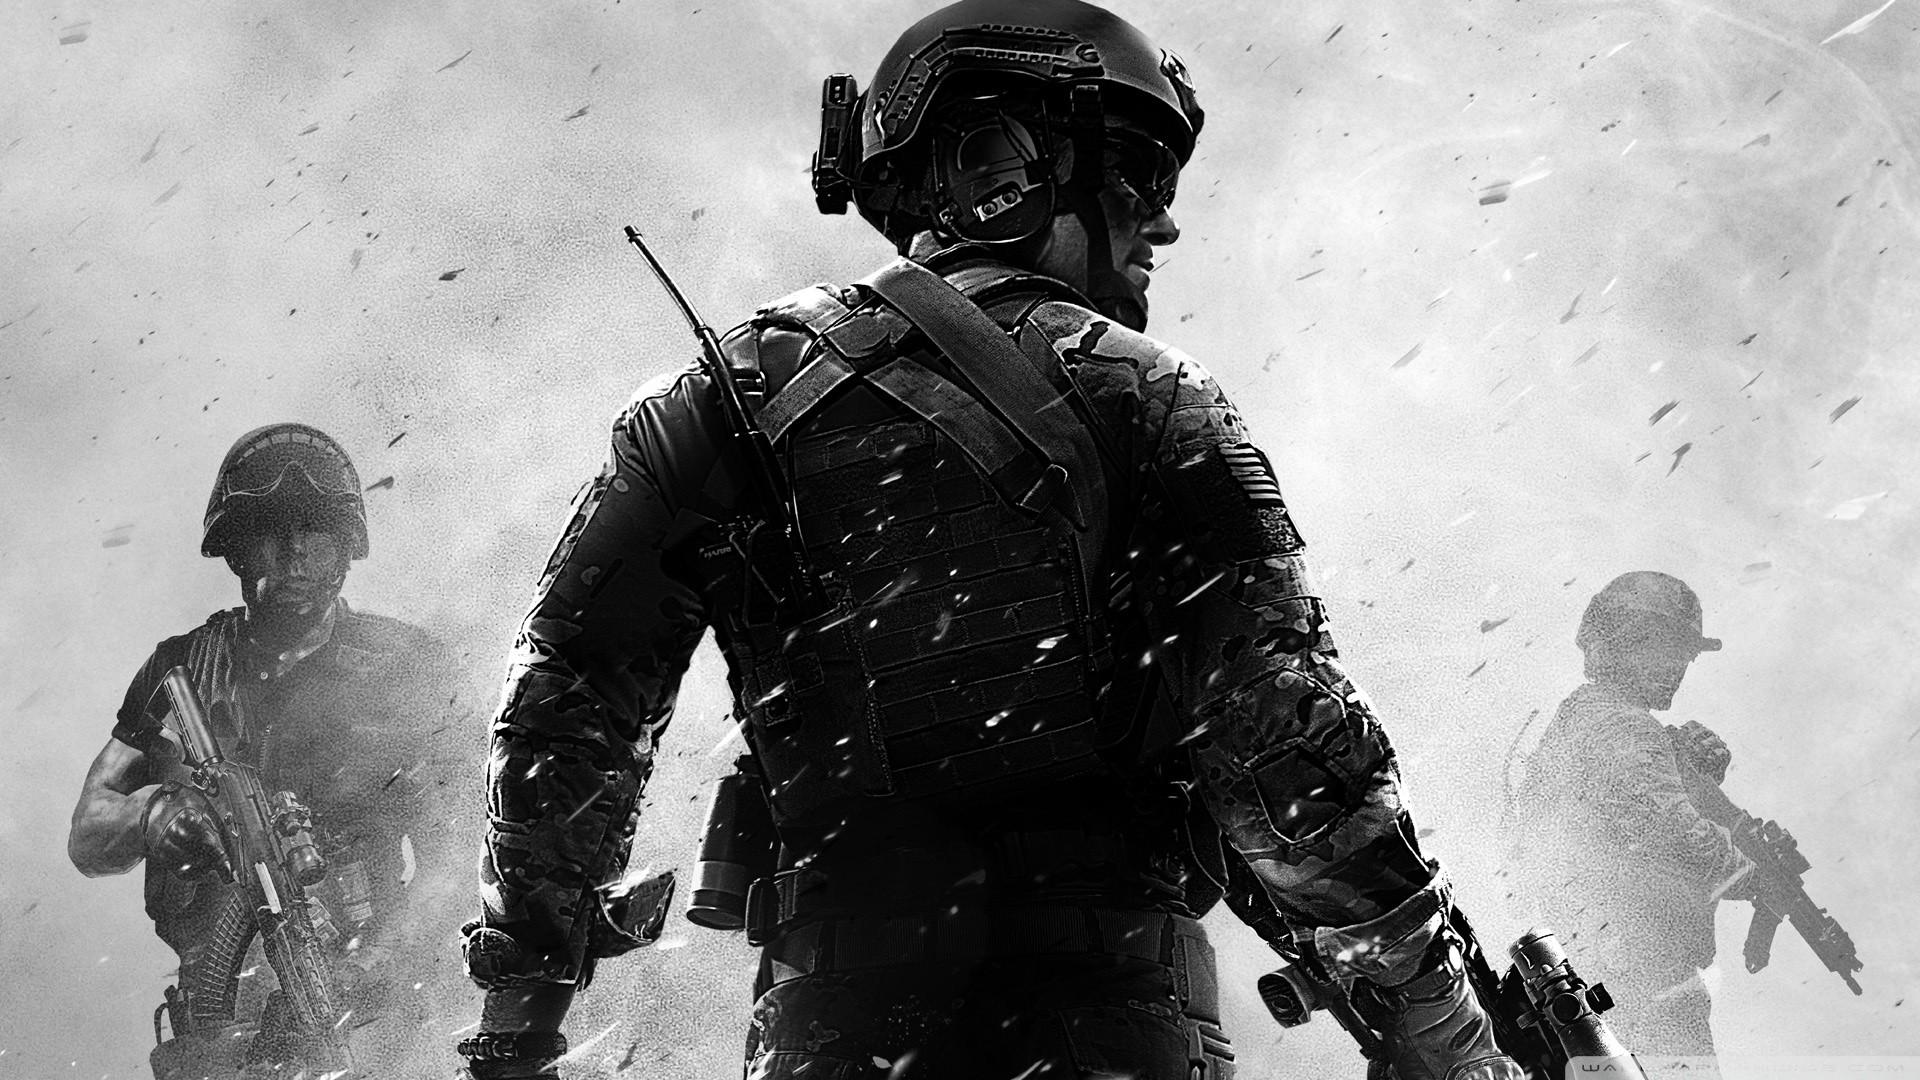 Call of Duty Modern Warfare  № 3671676 бесплатно